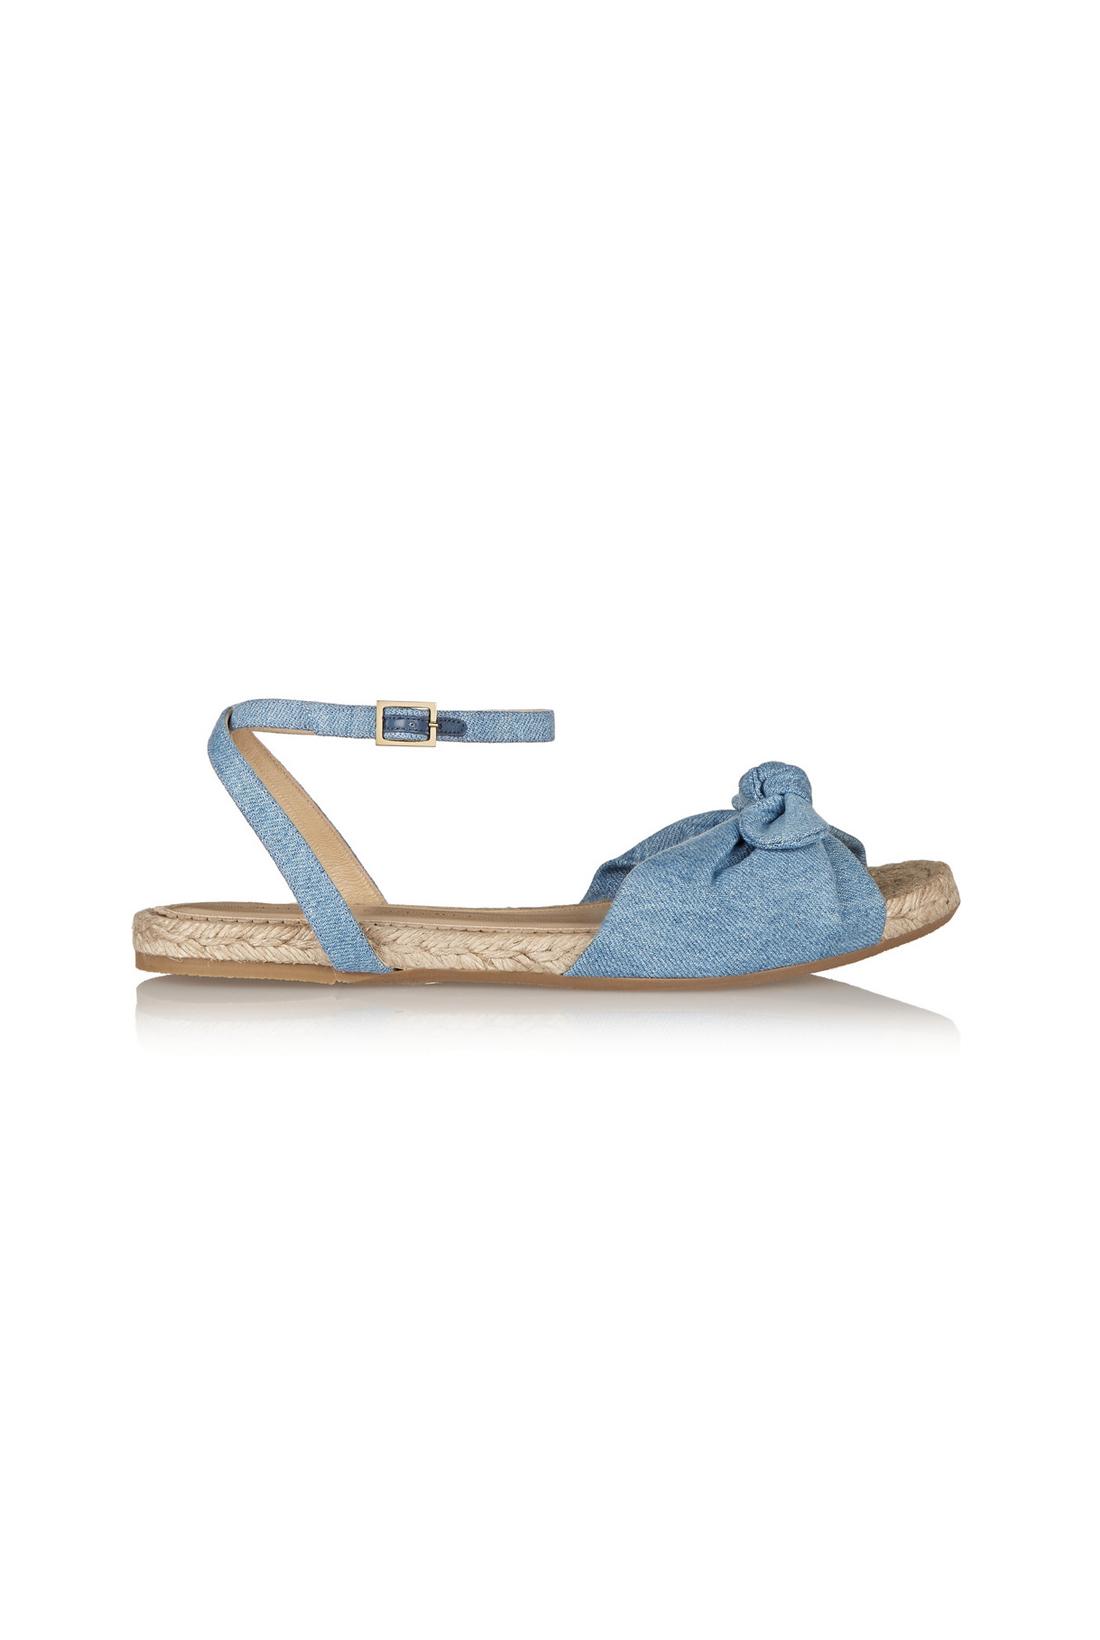 07-spring-denim-trends-shoes-01.jpg